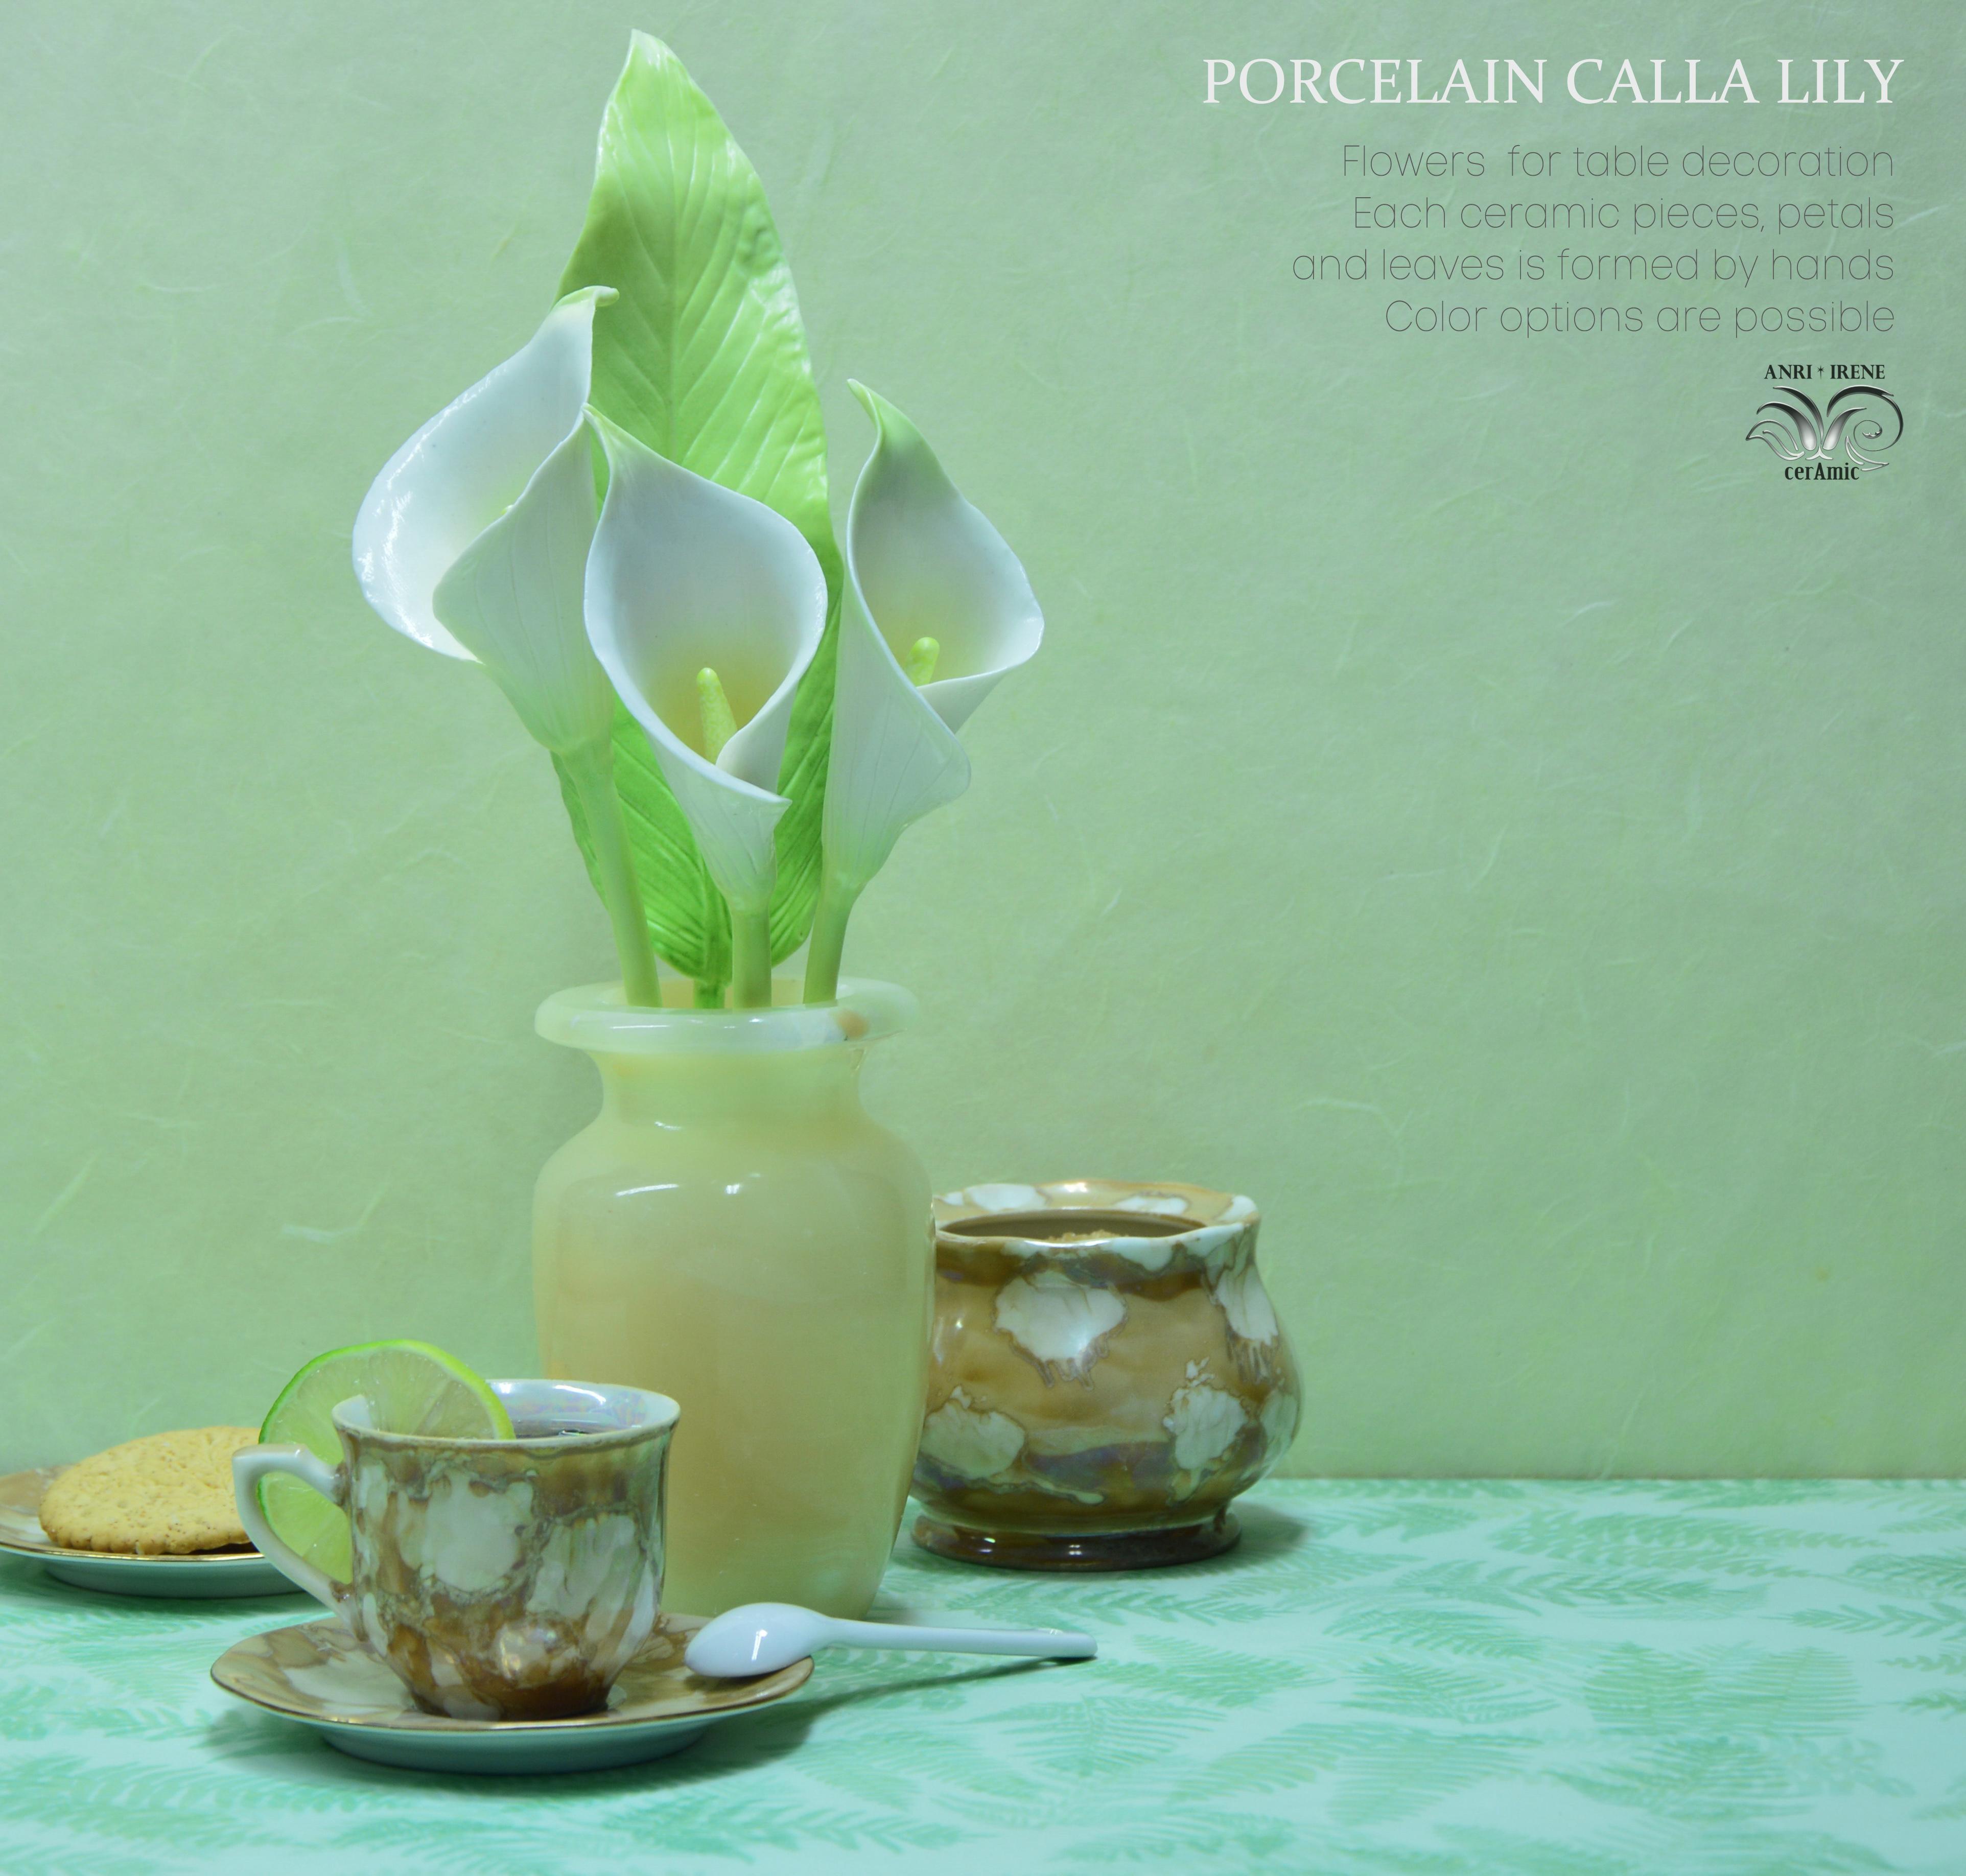 Porcelain calla lily